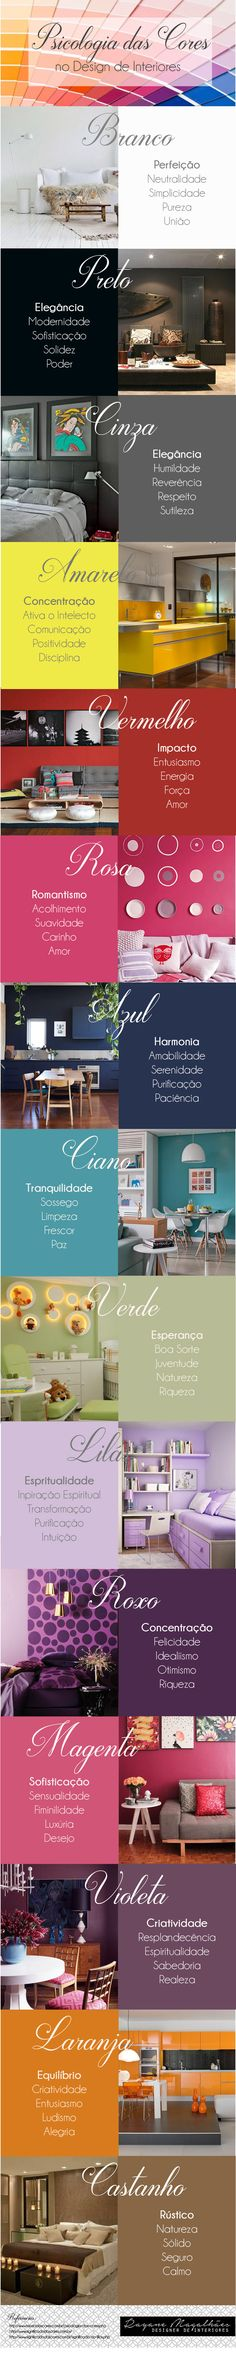 Psicologia das cores no Design de Interiores